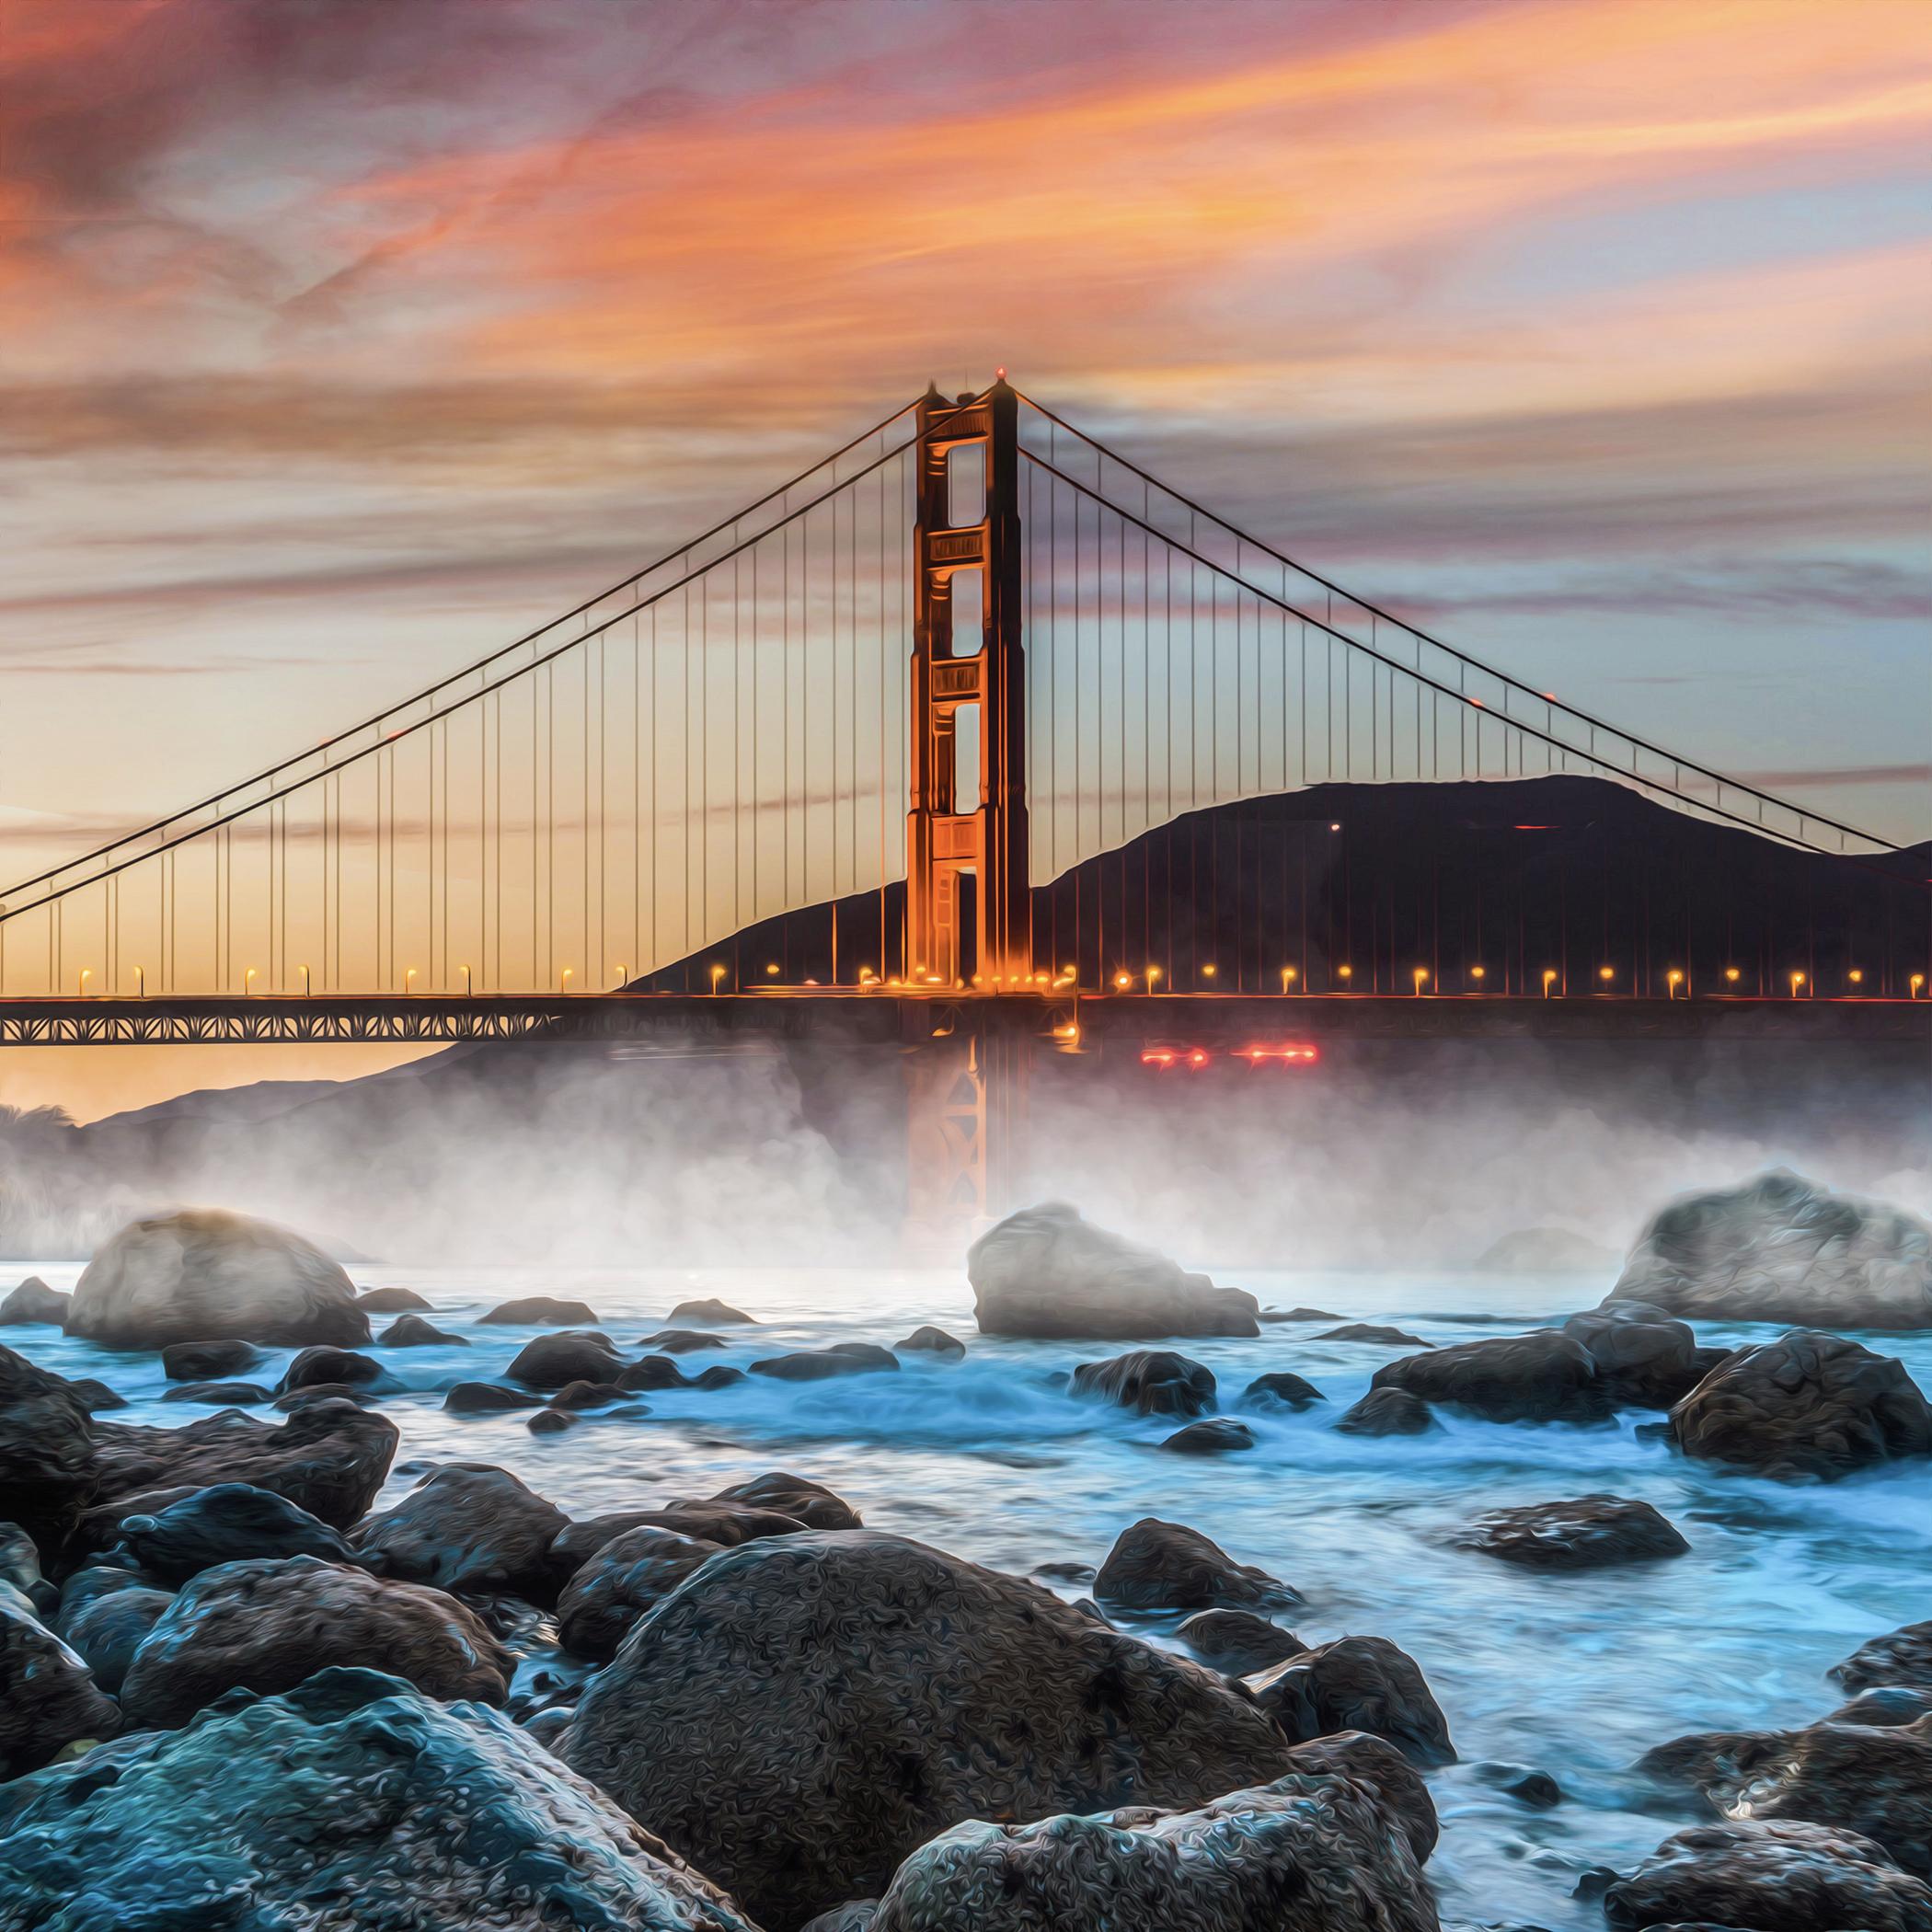 Goldie, February 2020. Photo of the San Francisco Golden Gate Bridge.